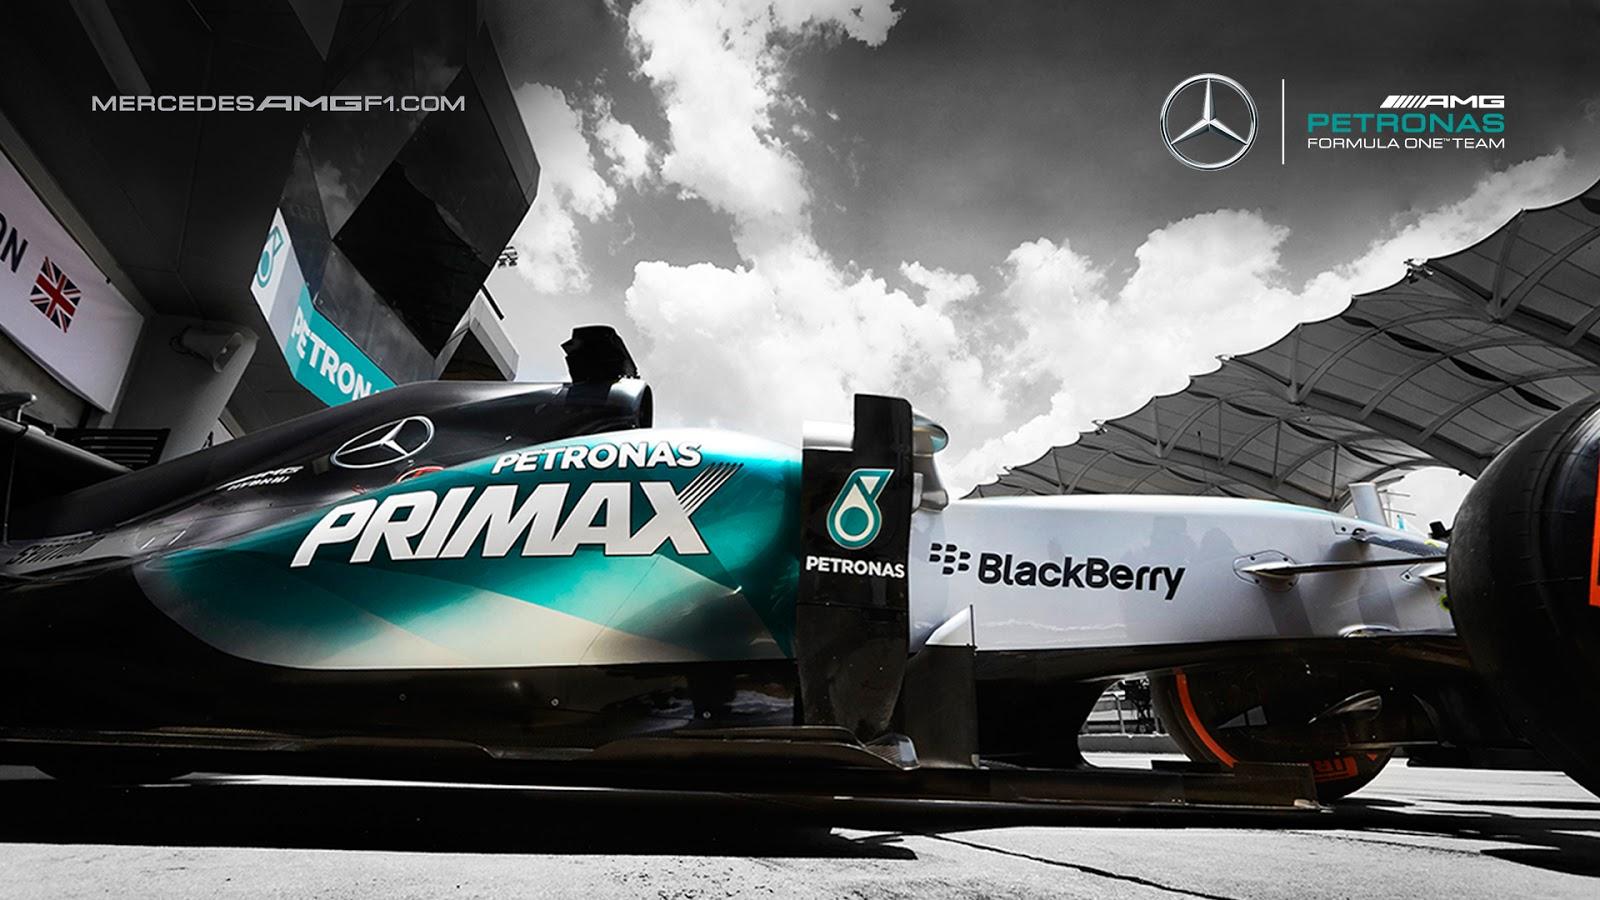 Mercedes Amg Petronas F1 Hd Hintergrundbilder 4k: Mercedes AMG Petronas W06 2015 F1 Wallpaper